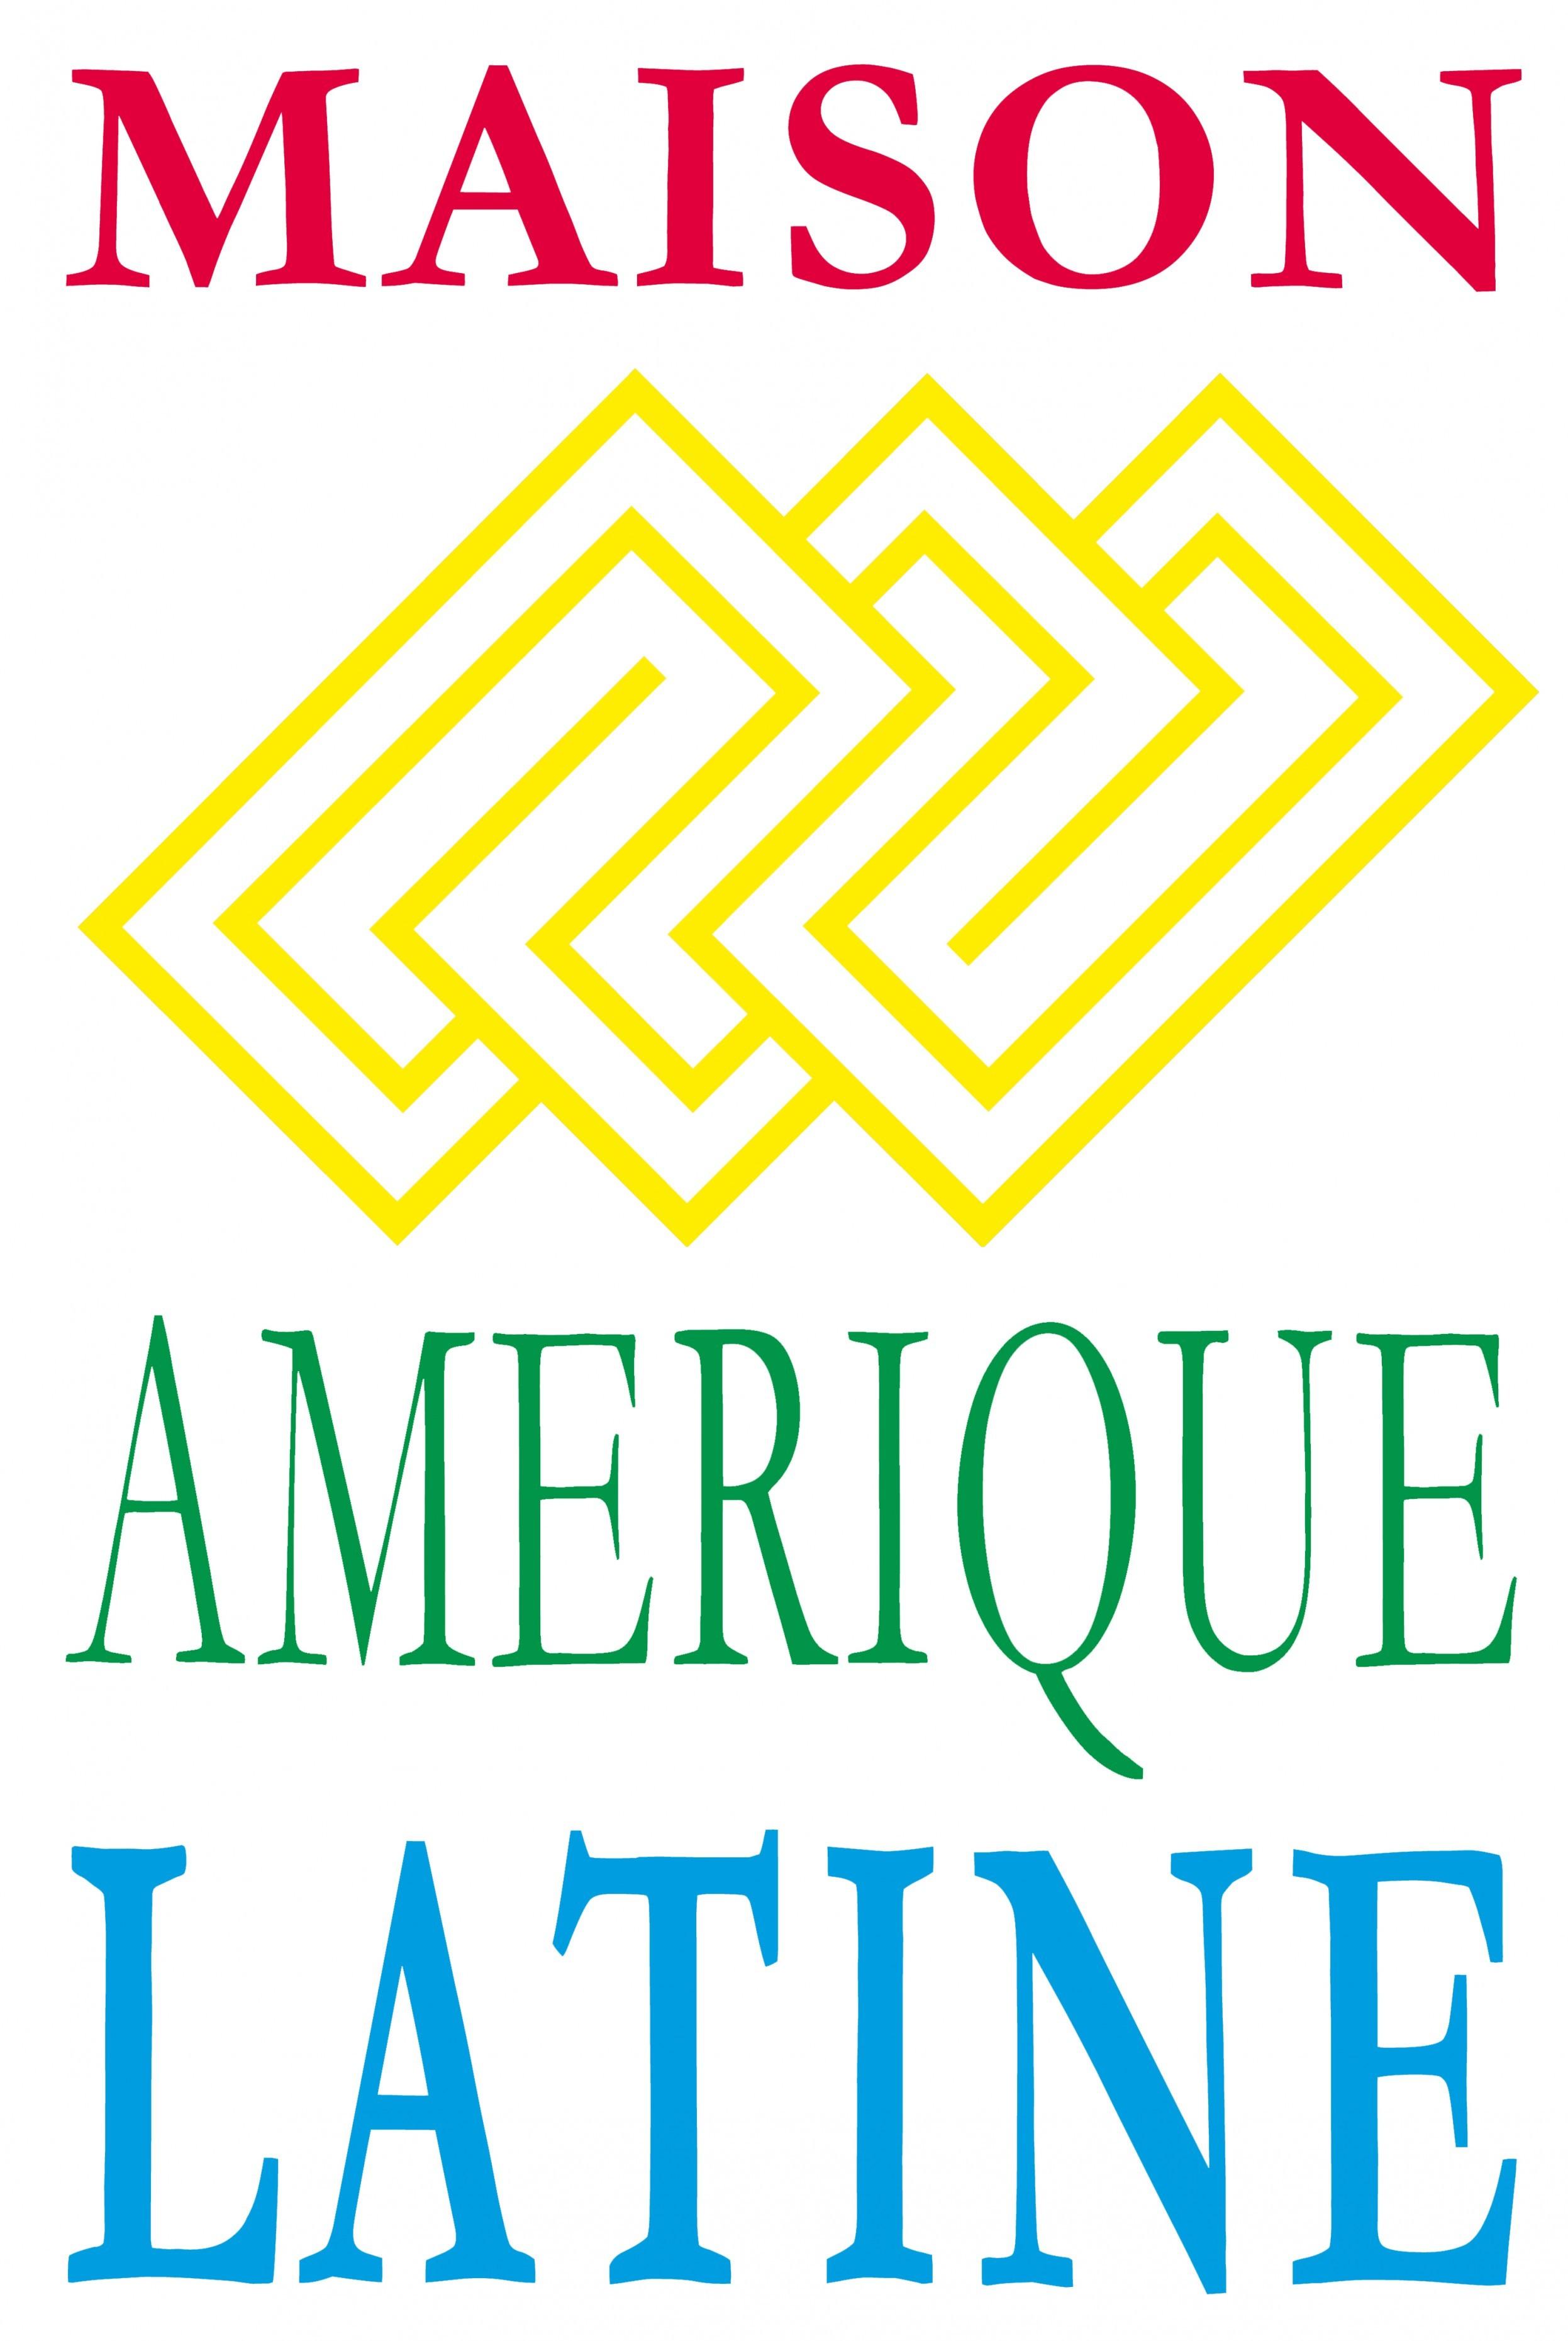 Projet 2 logo